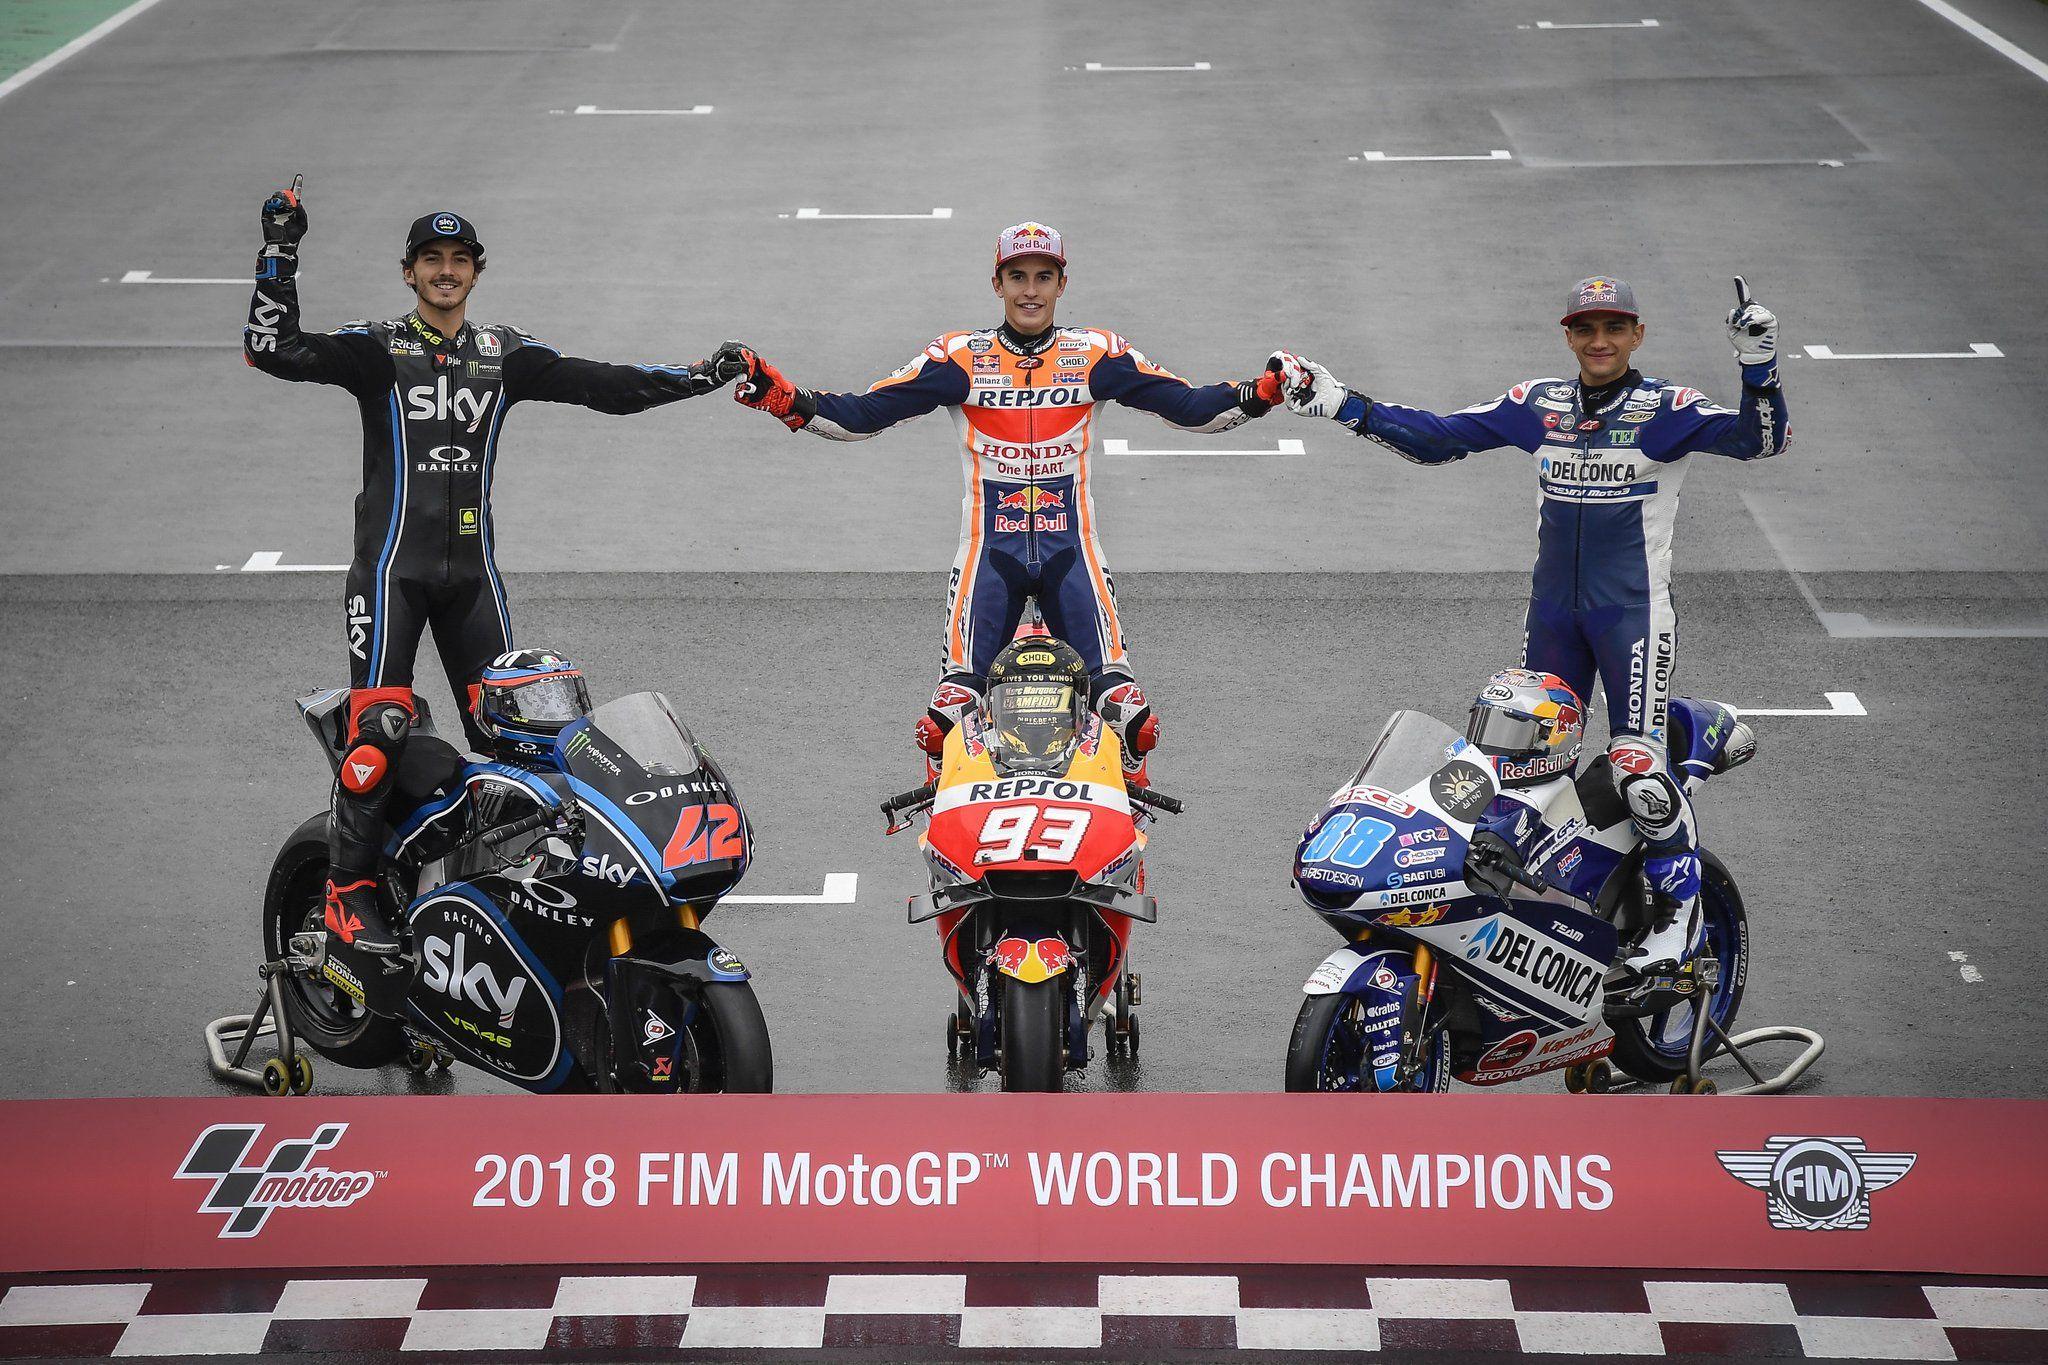 2018 Fim Motogp World Champions Moto3 Moto2 And Motogp Class Pembalap Tsunami